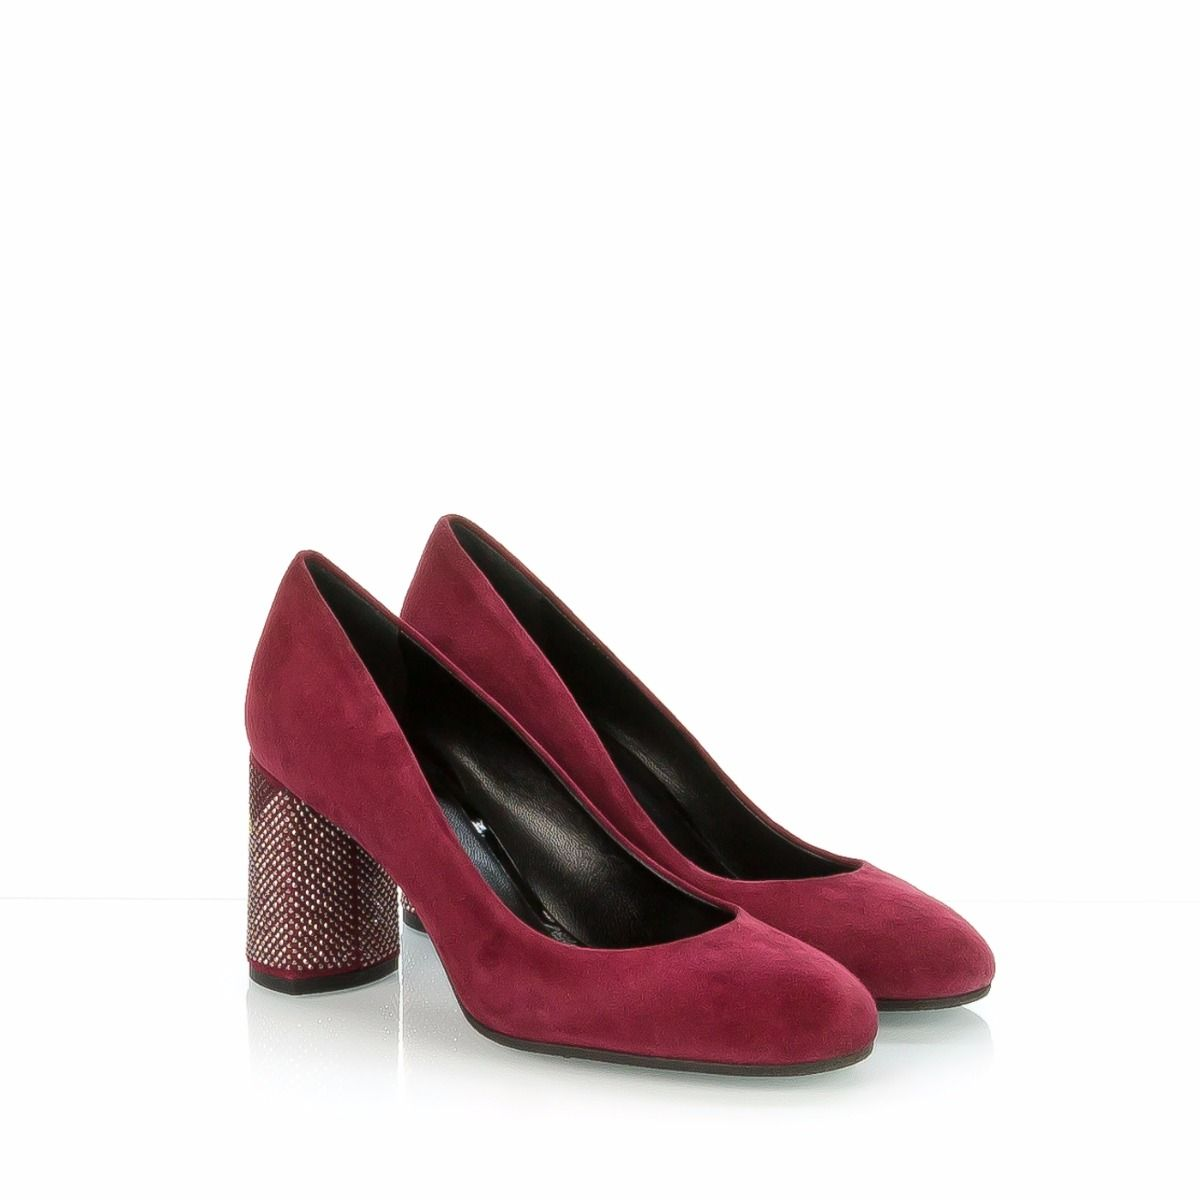 Sneakers bordeaux per donna Malù Costo De La Venta Barata 2k3jXQb